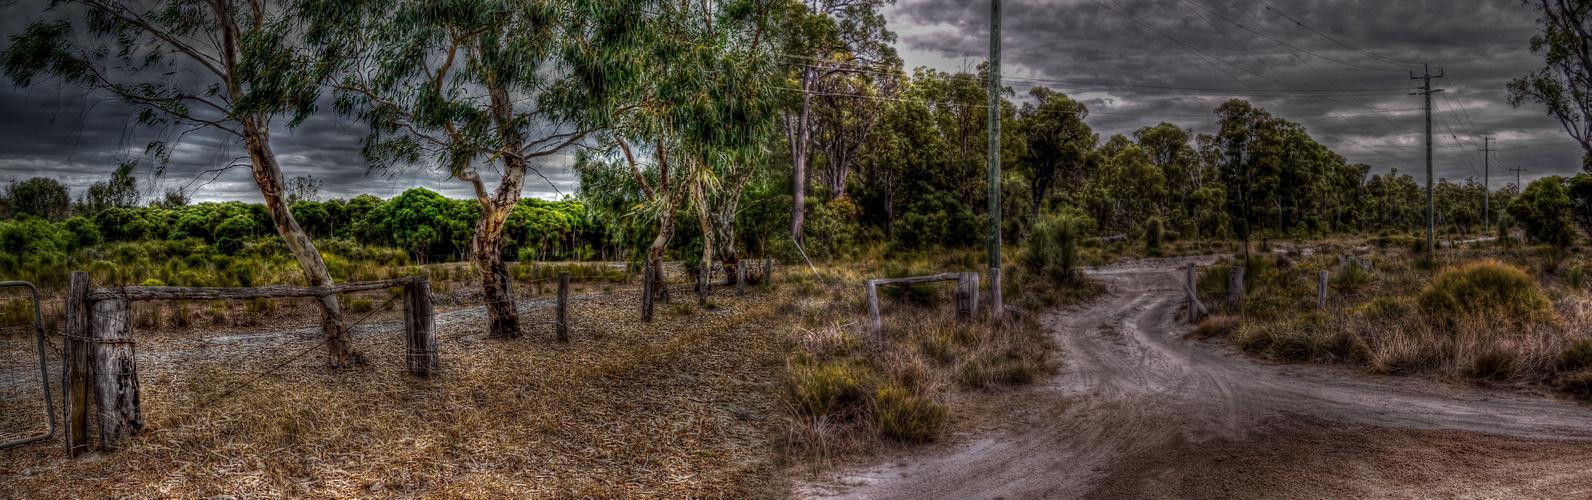 Autumn in Australia #2